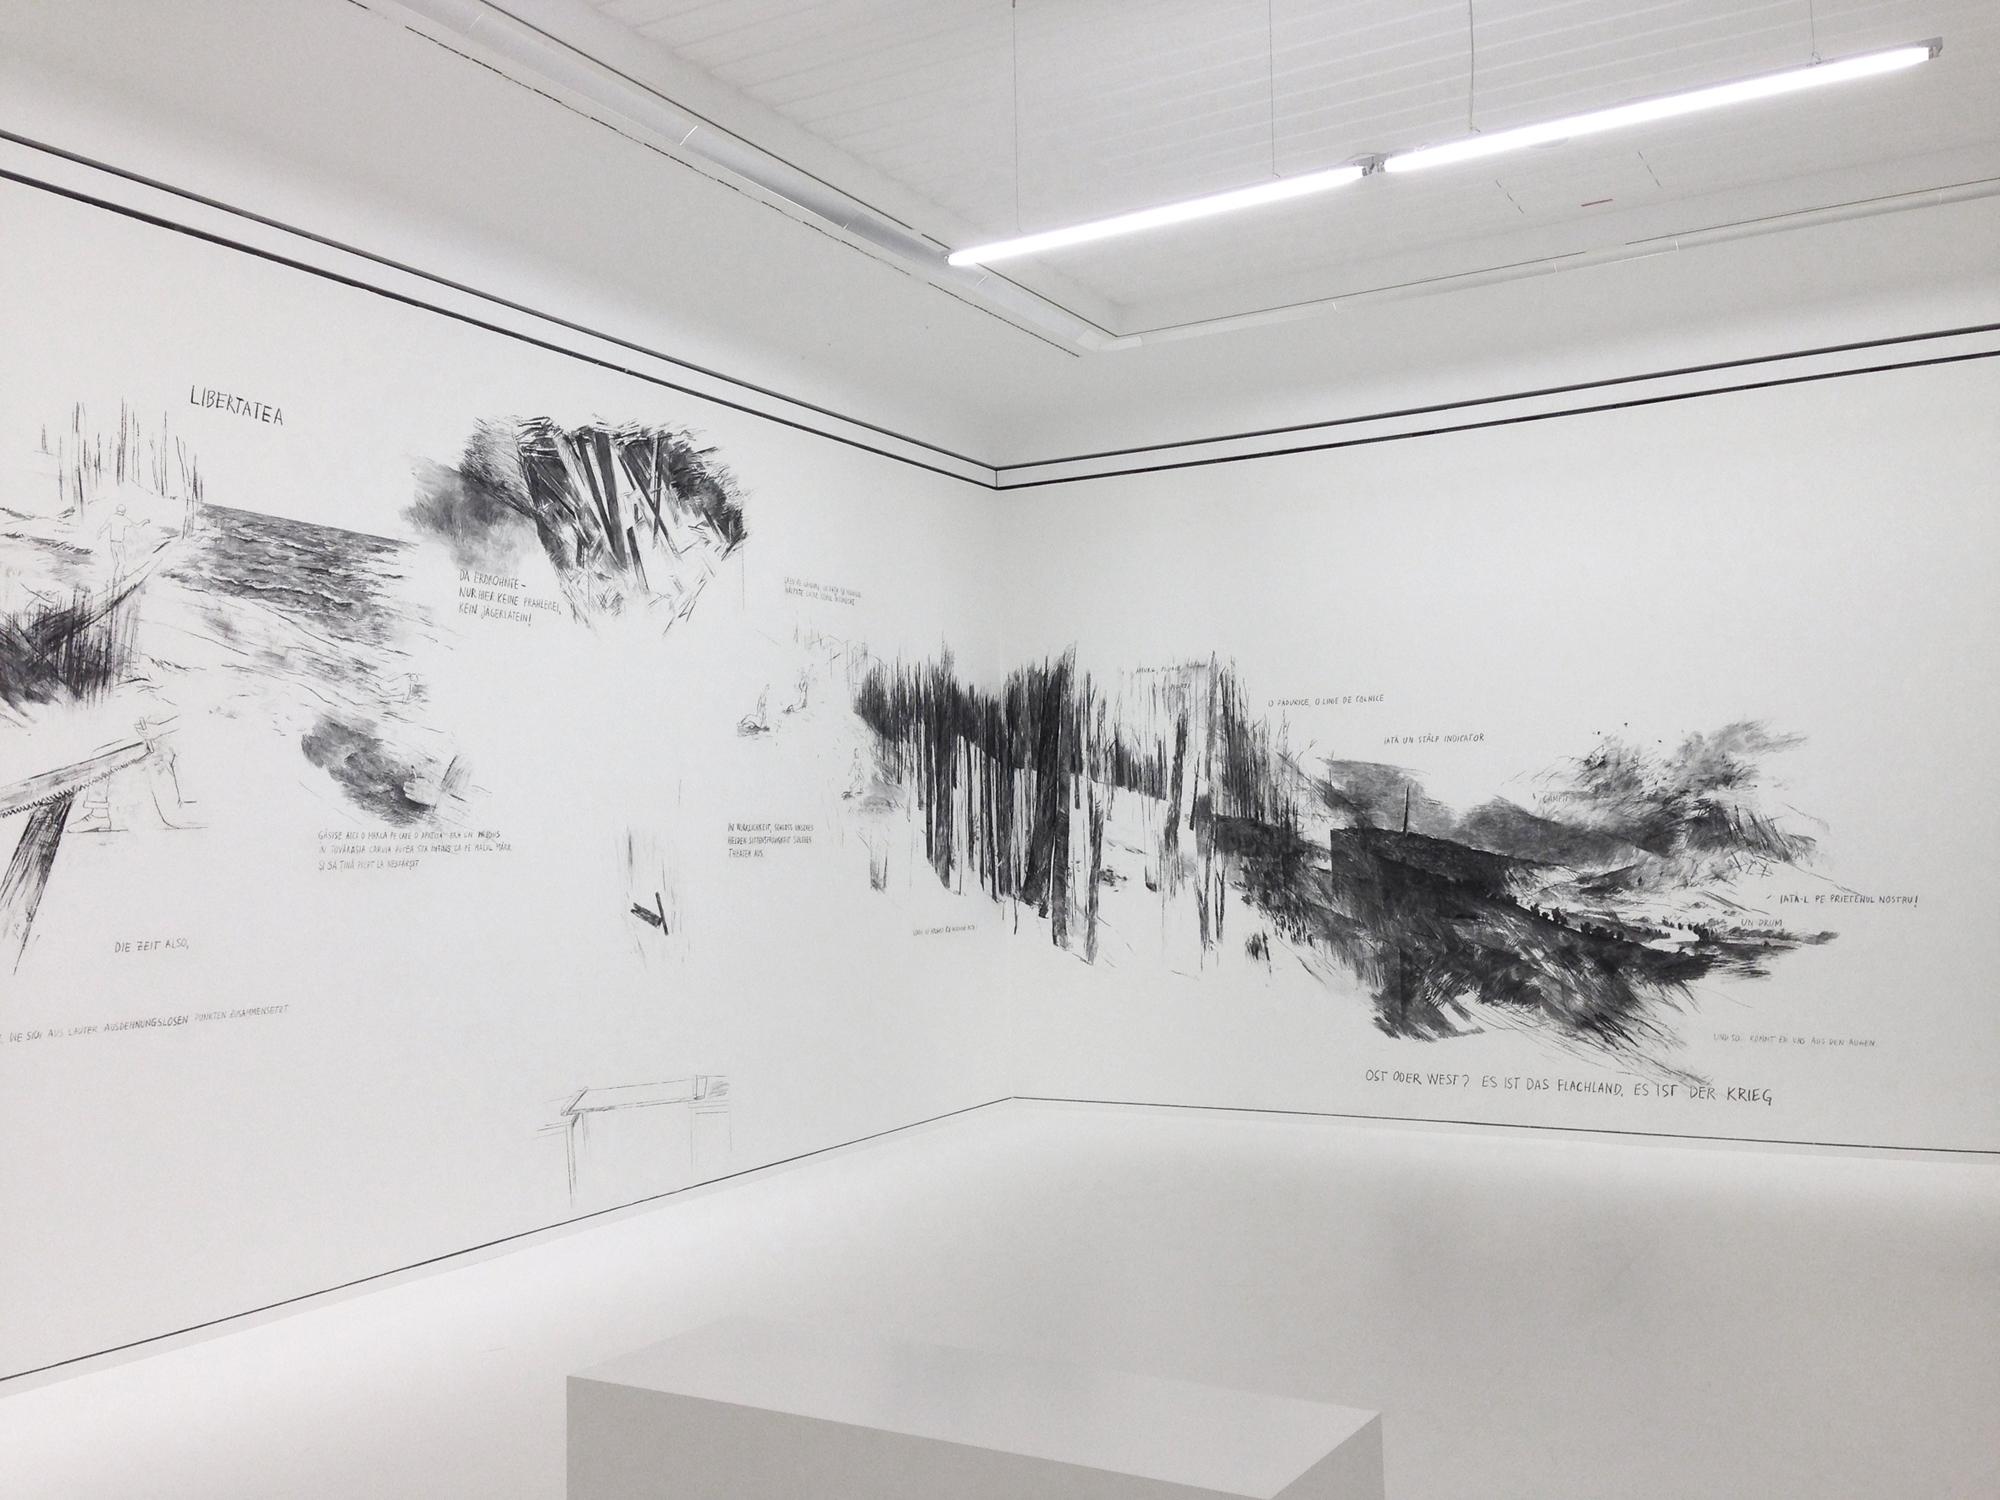 MÄNNERAKT (2014) graphite, charcoal drawing, dimensions variable, Exhibition view Leopold Museum, Vienna, Image copyright: Paul Hemetsberger